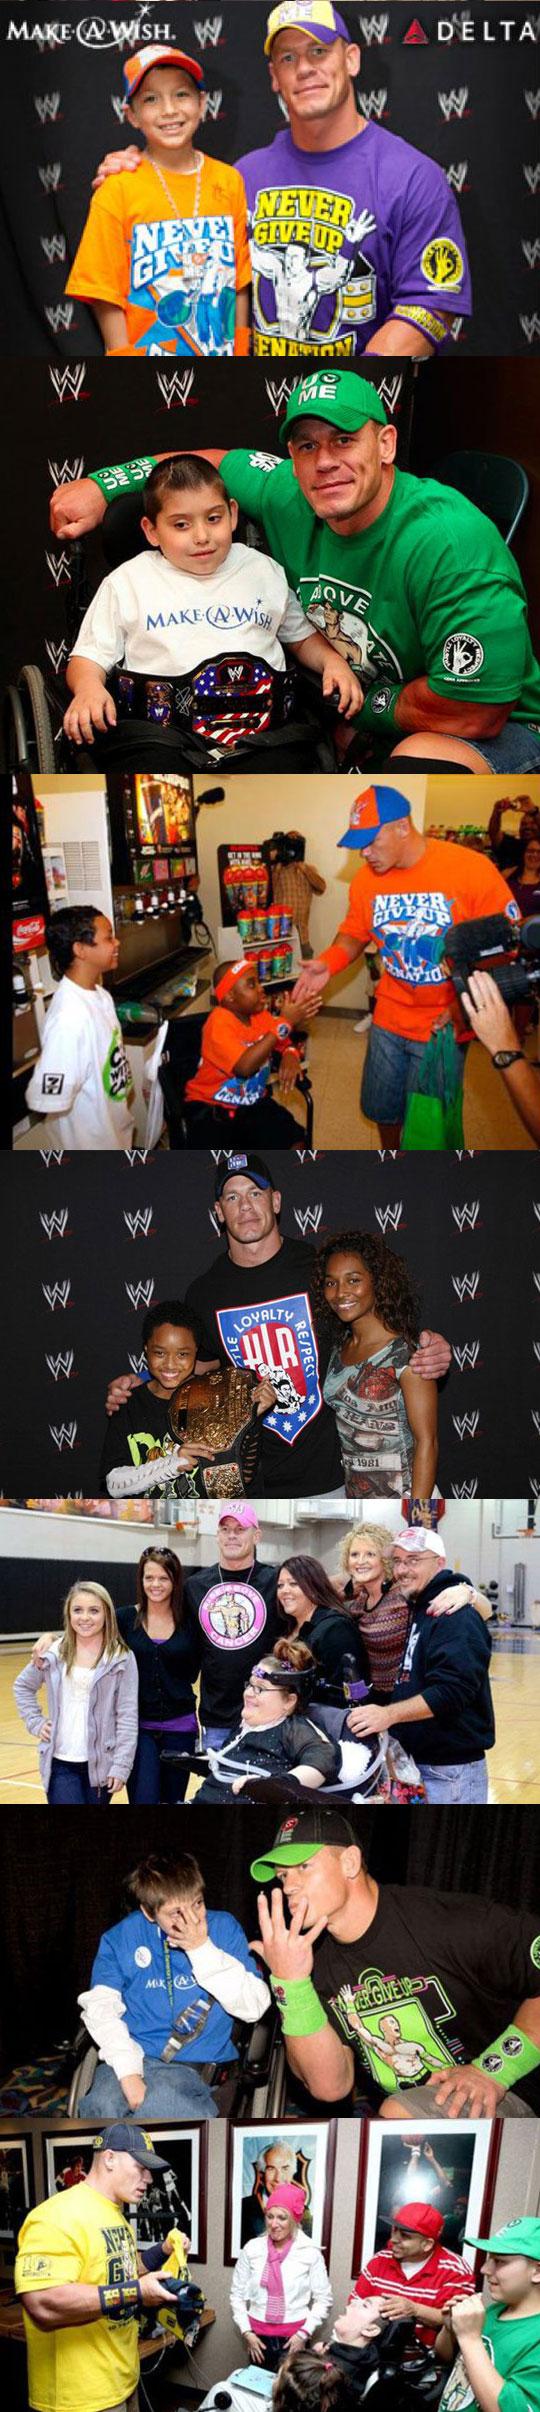 cool-John-Cena-Make-A-Wish-kids-wrestler